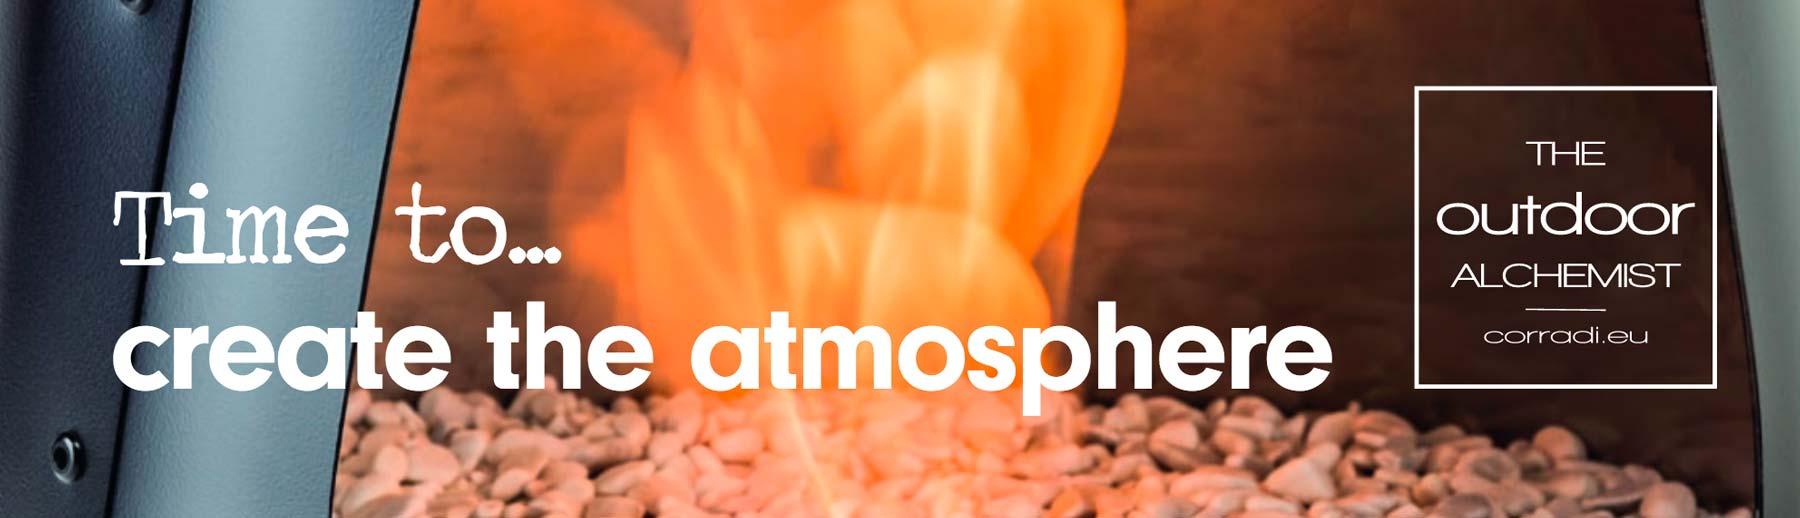 Time to create rhe atmosphere